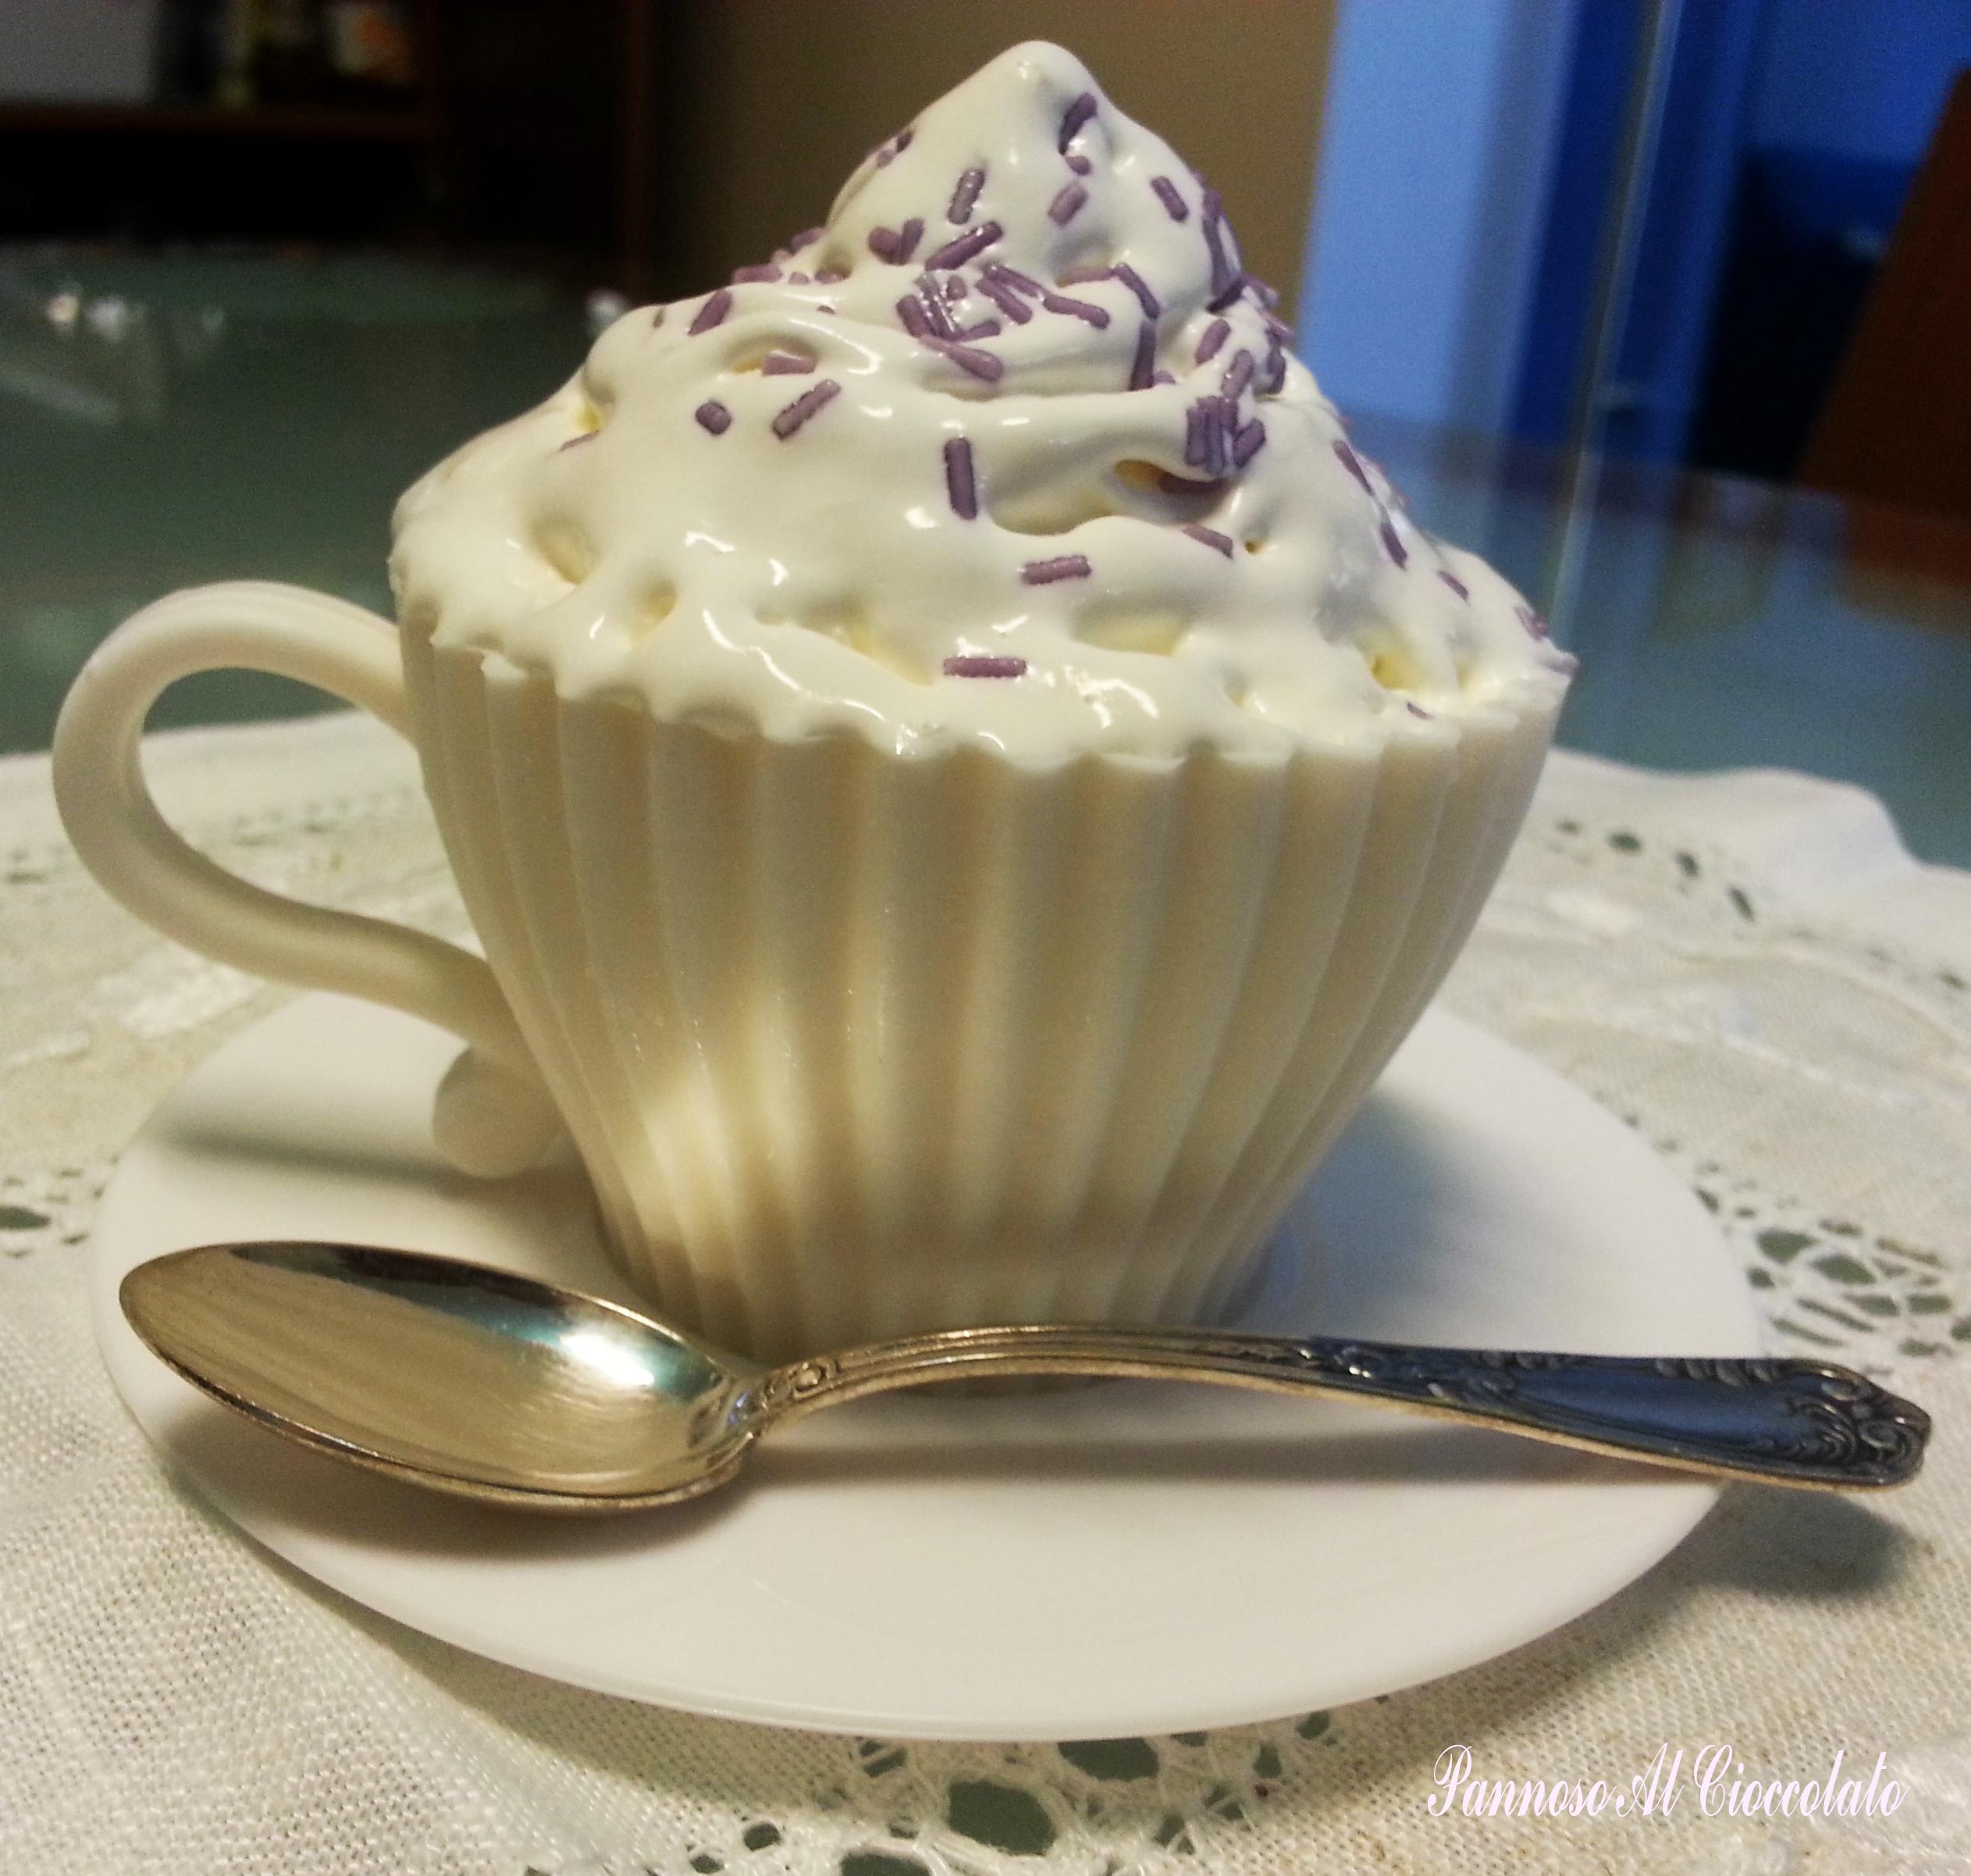 Frosting cioccolato bianco e philadelphia